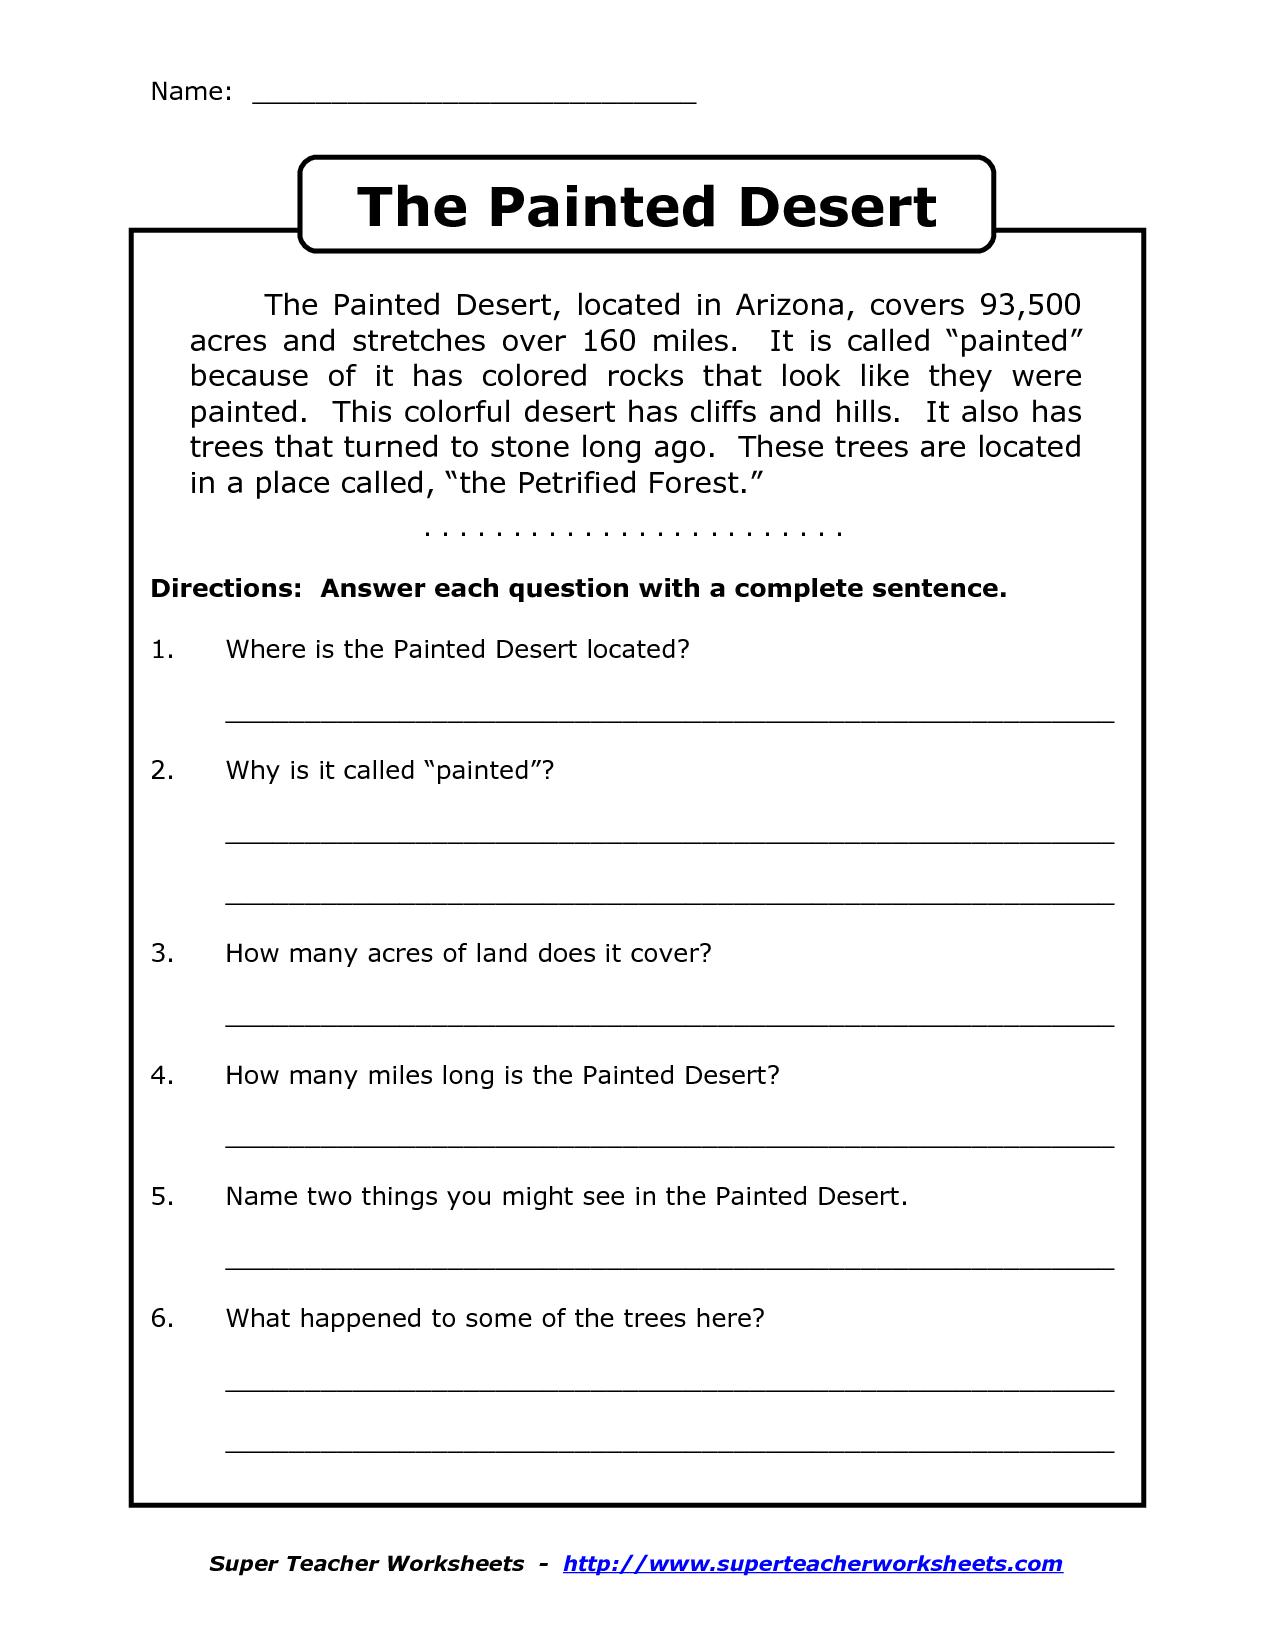 Reading Comprehension Worksheets Grade 3 in 2020   4th grade reading  worksheets [ 1650 x 1275 Pixel ]